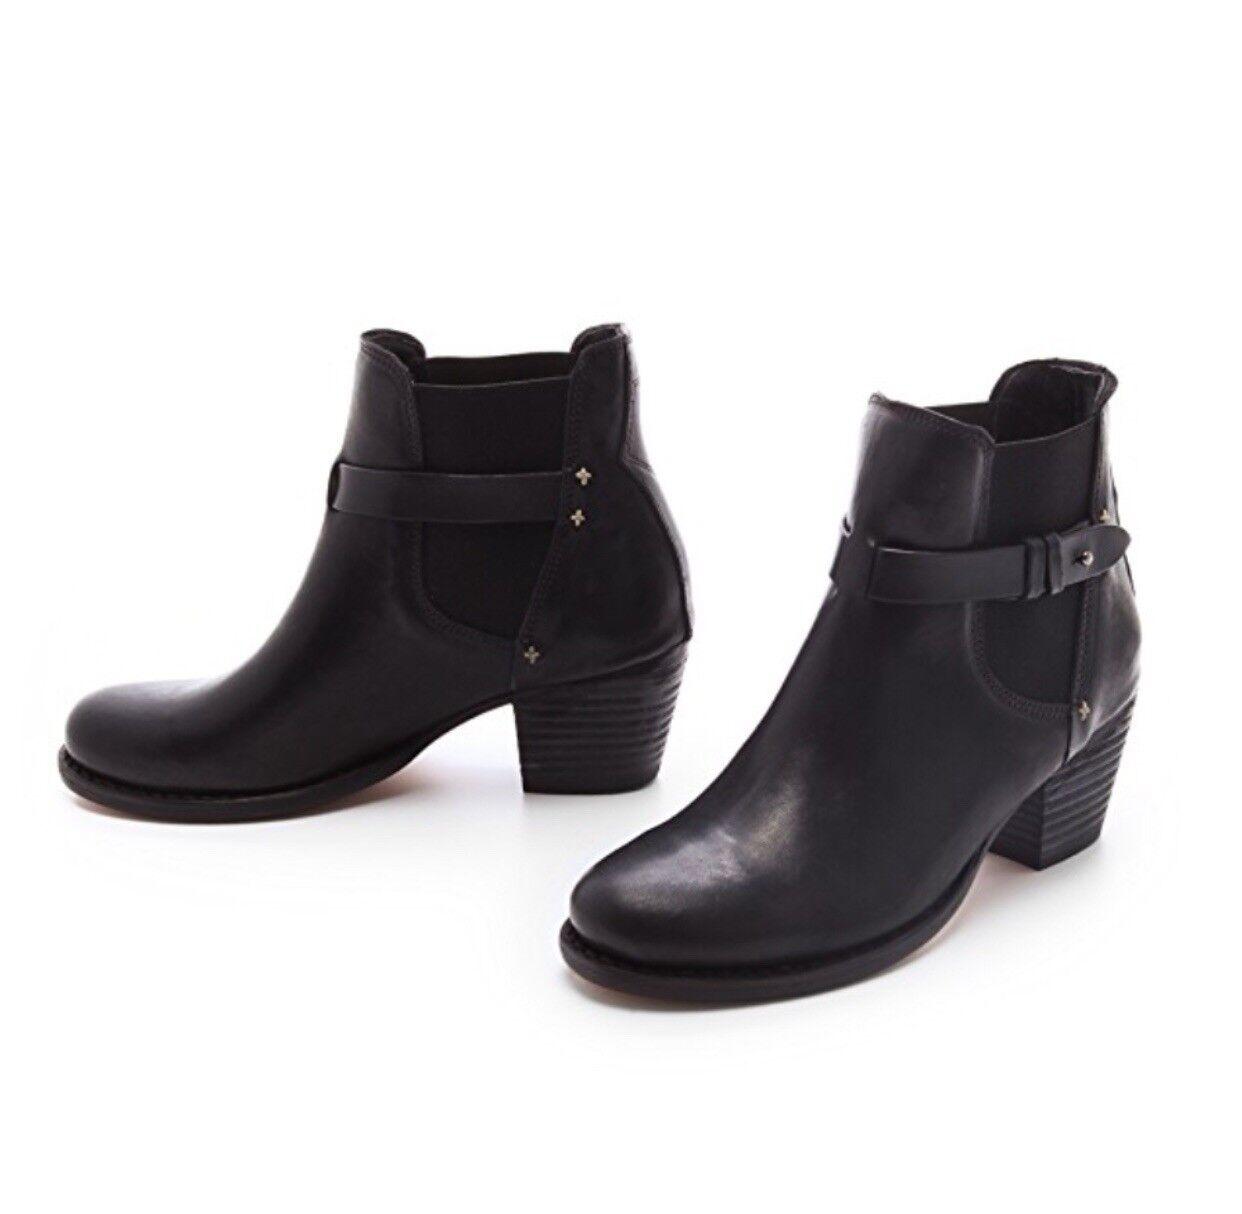 Rag & Bone Black Durham Chelsea Ankle Boot Size EU 39.5, US 9.5